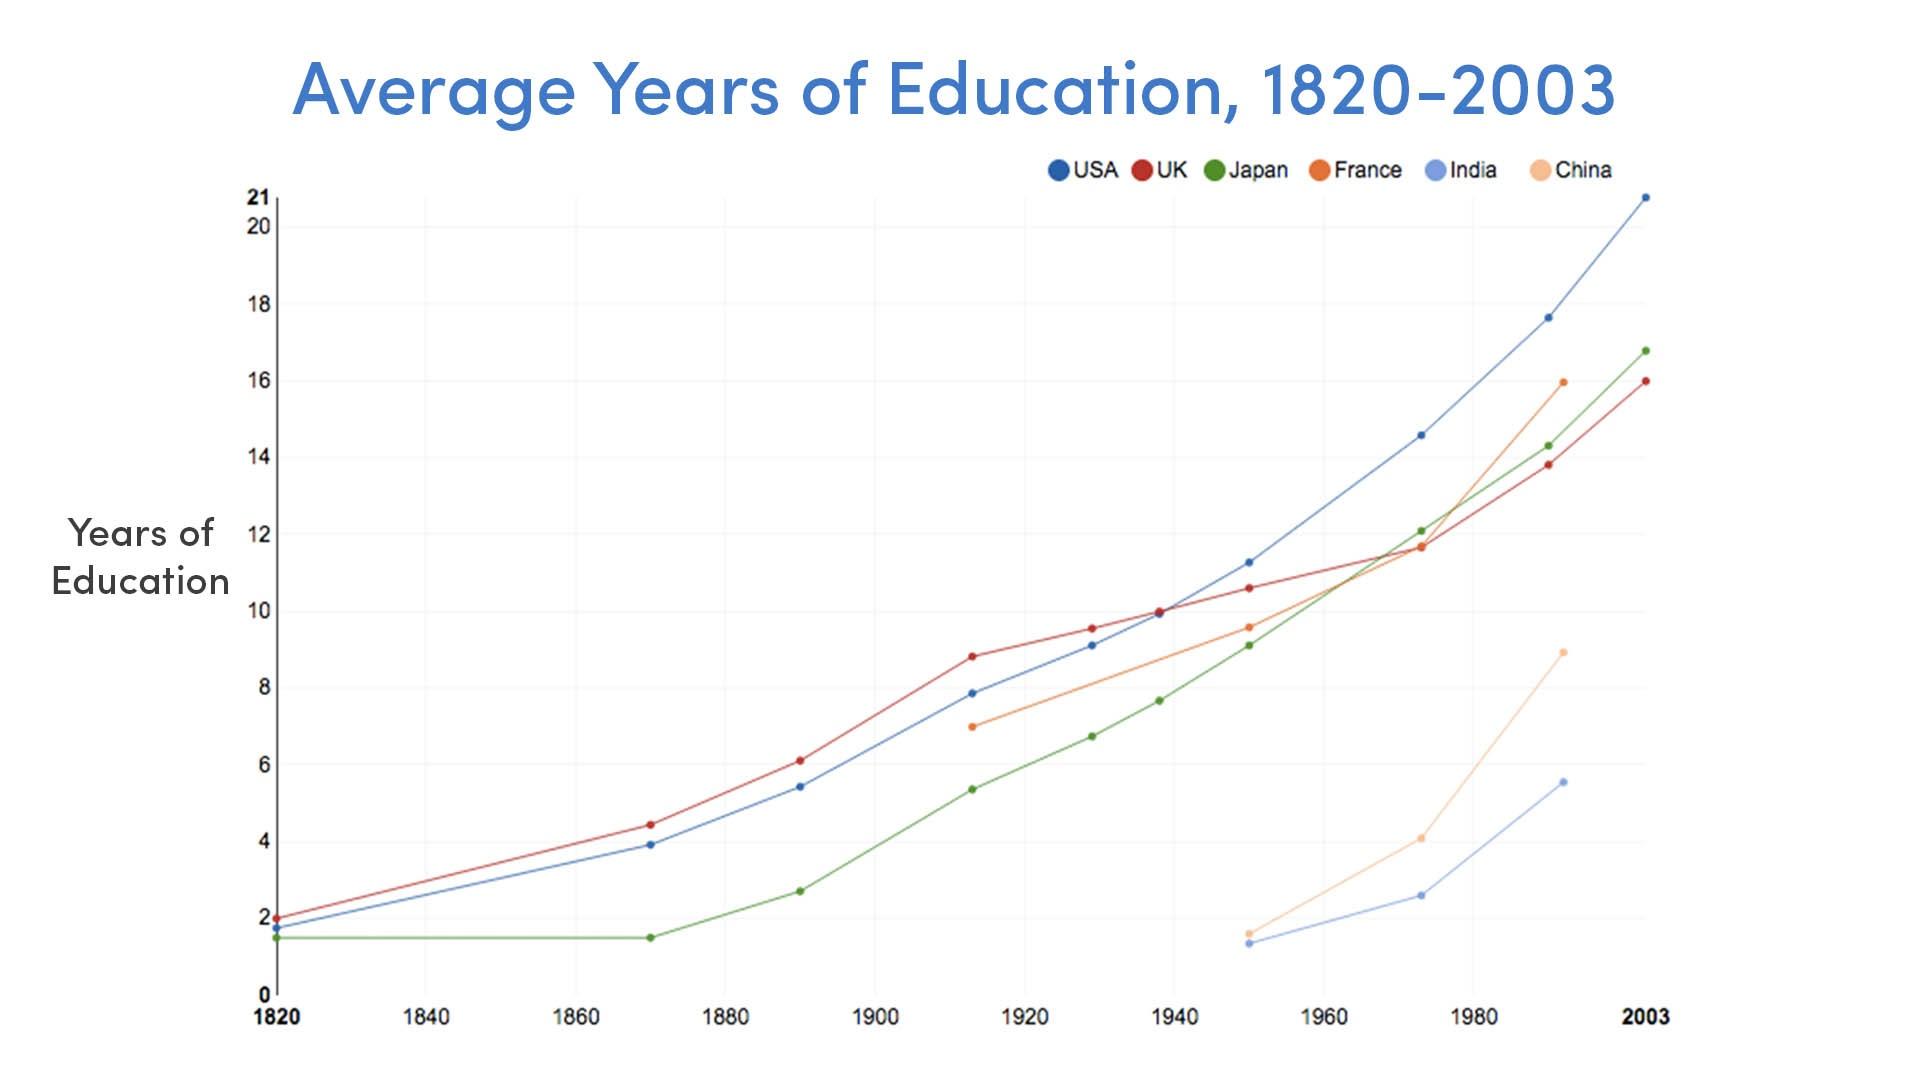 Average Years of Education